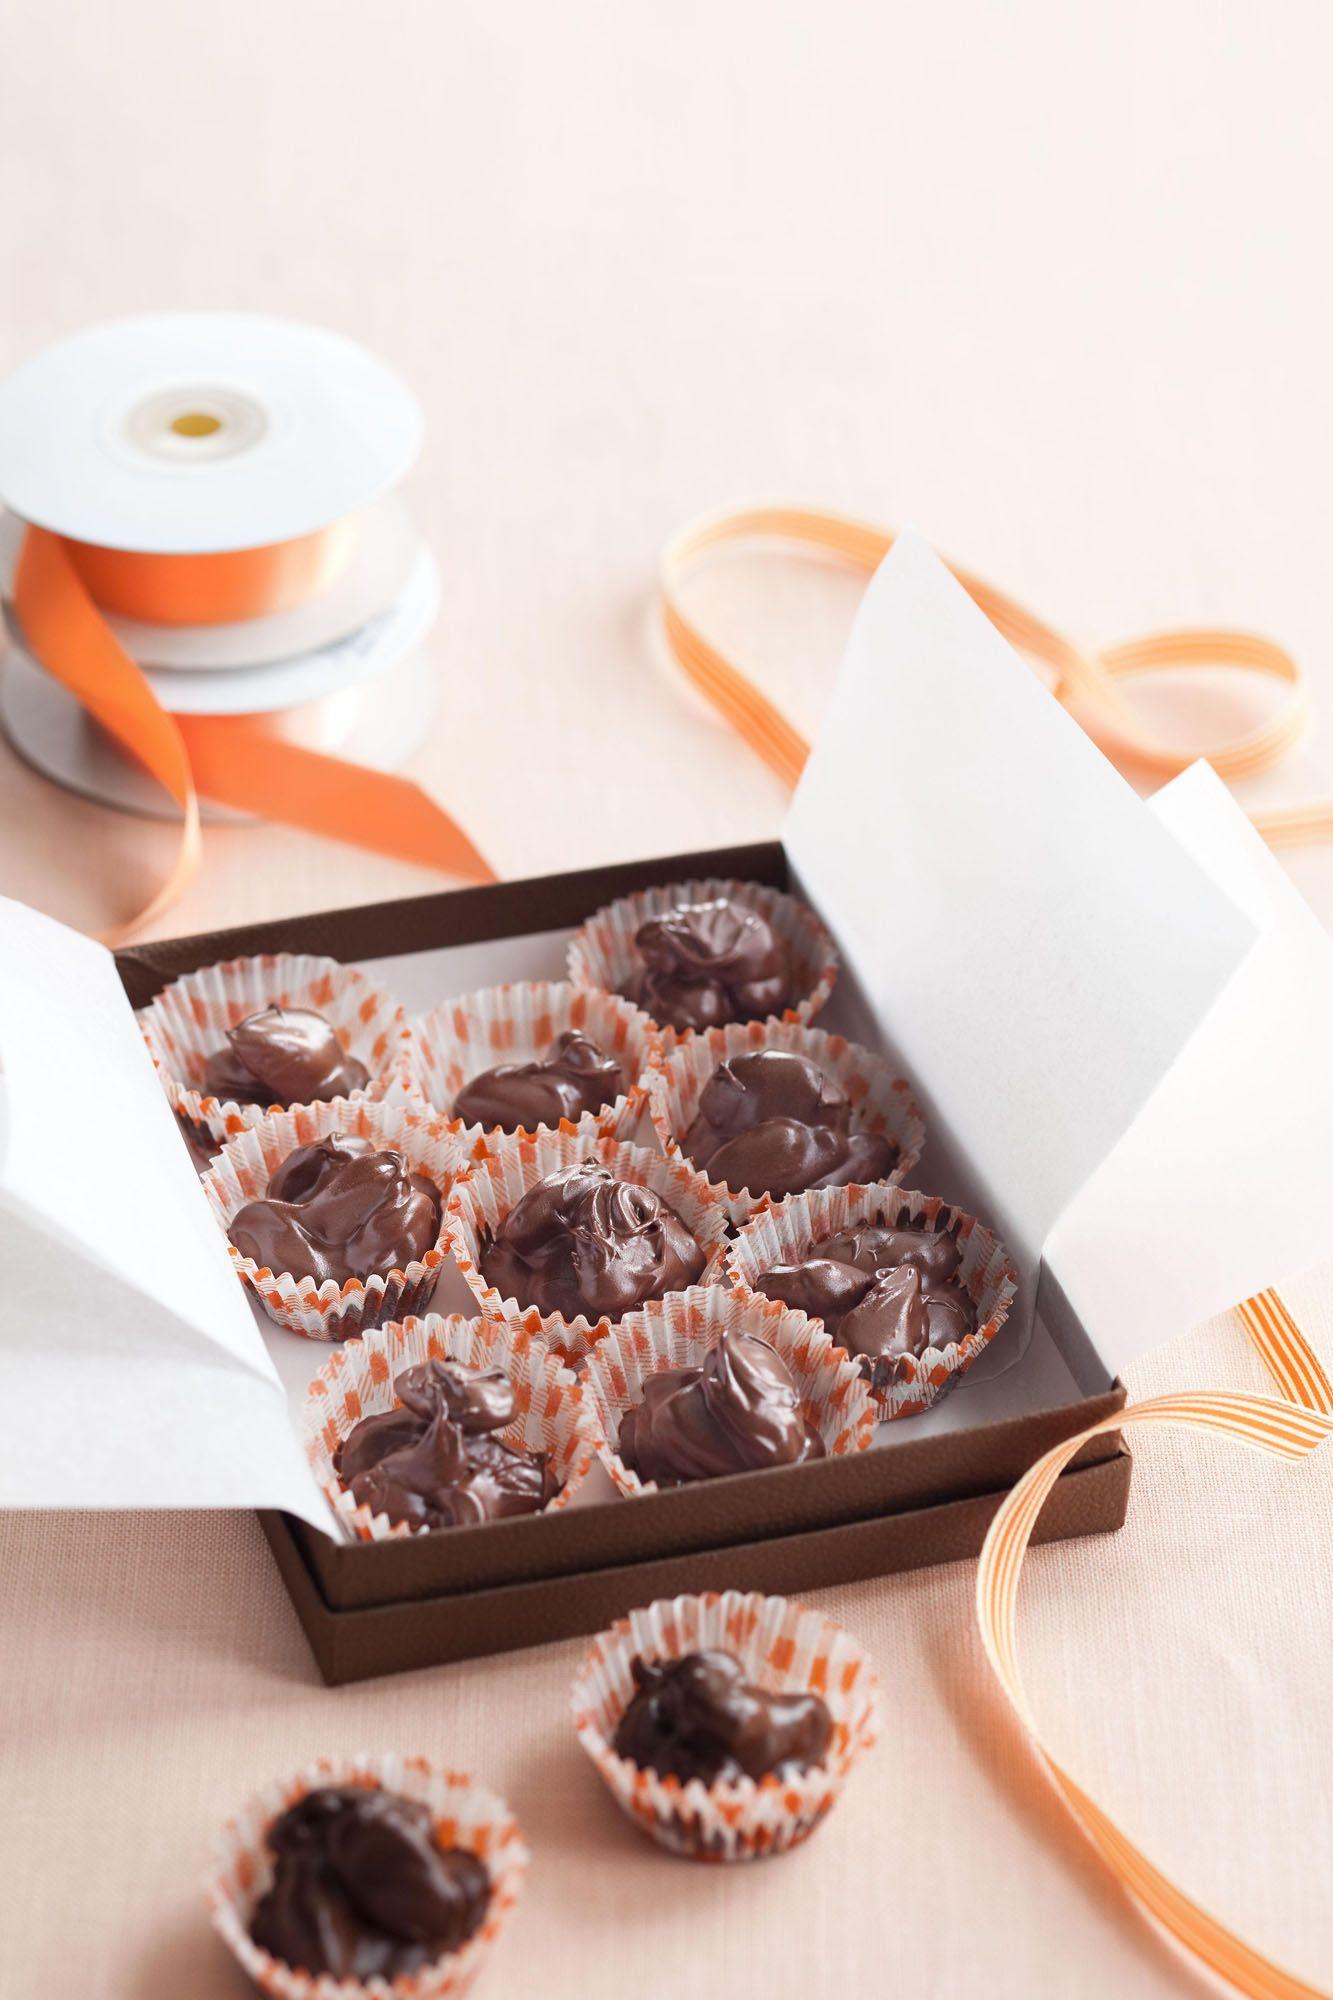 50 Homemade Christmas Food Gifts - DIY Ideas for Edible Holiday ...